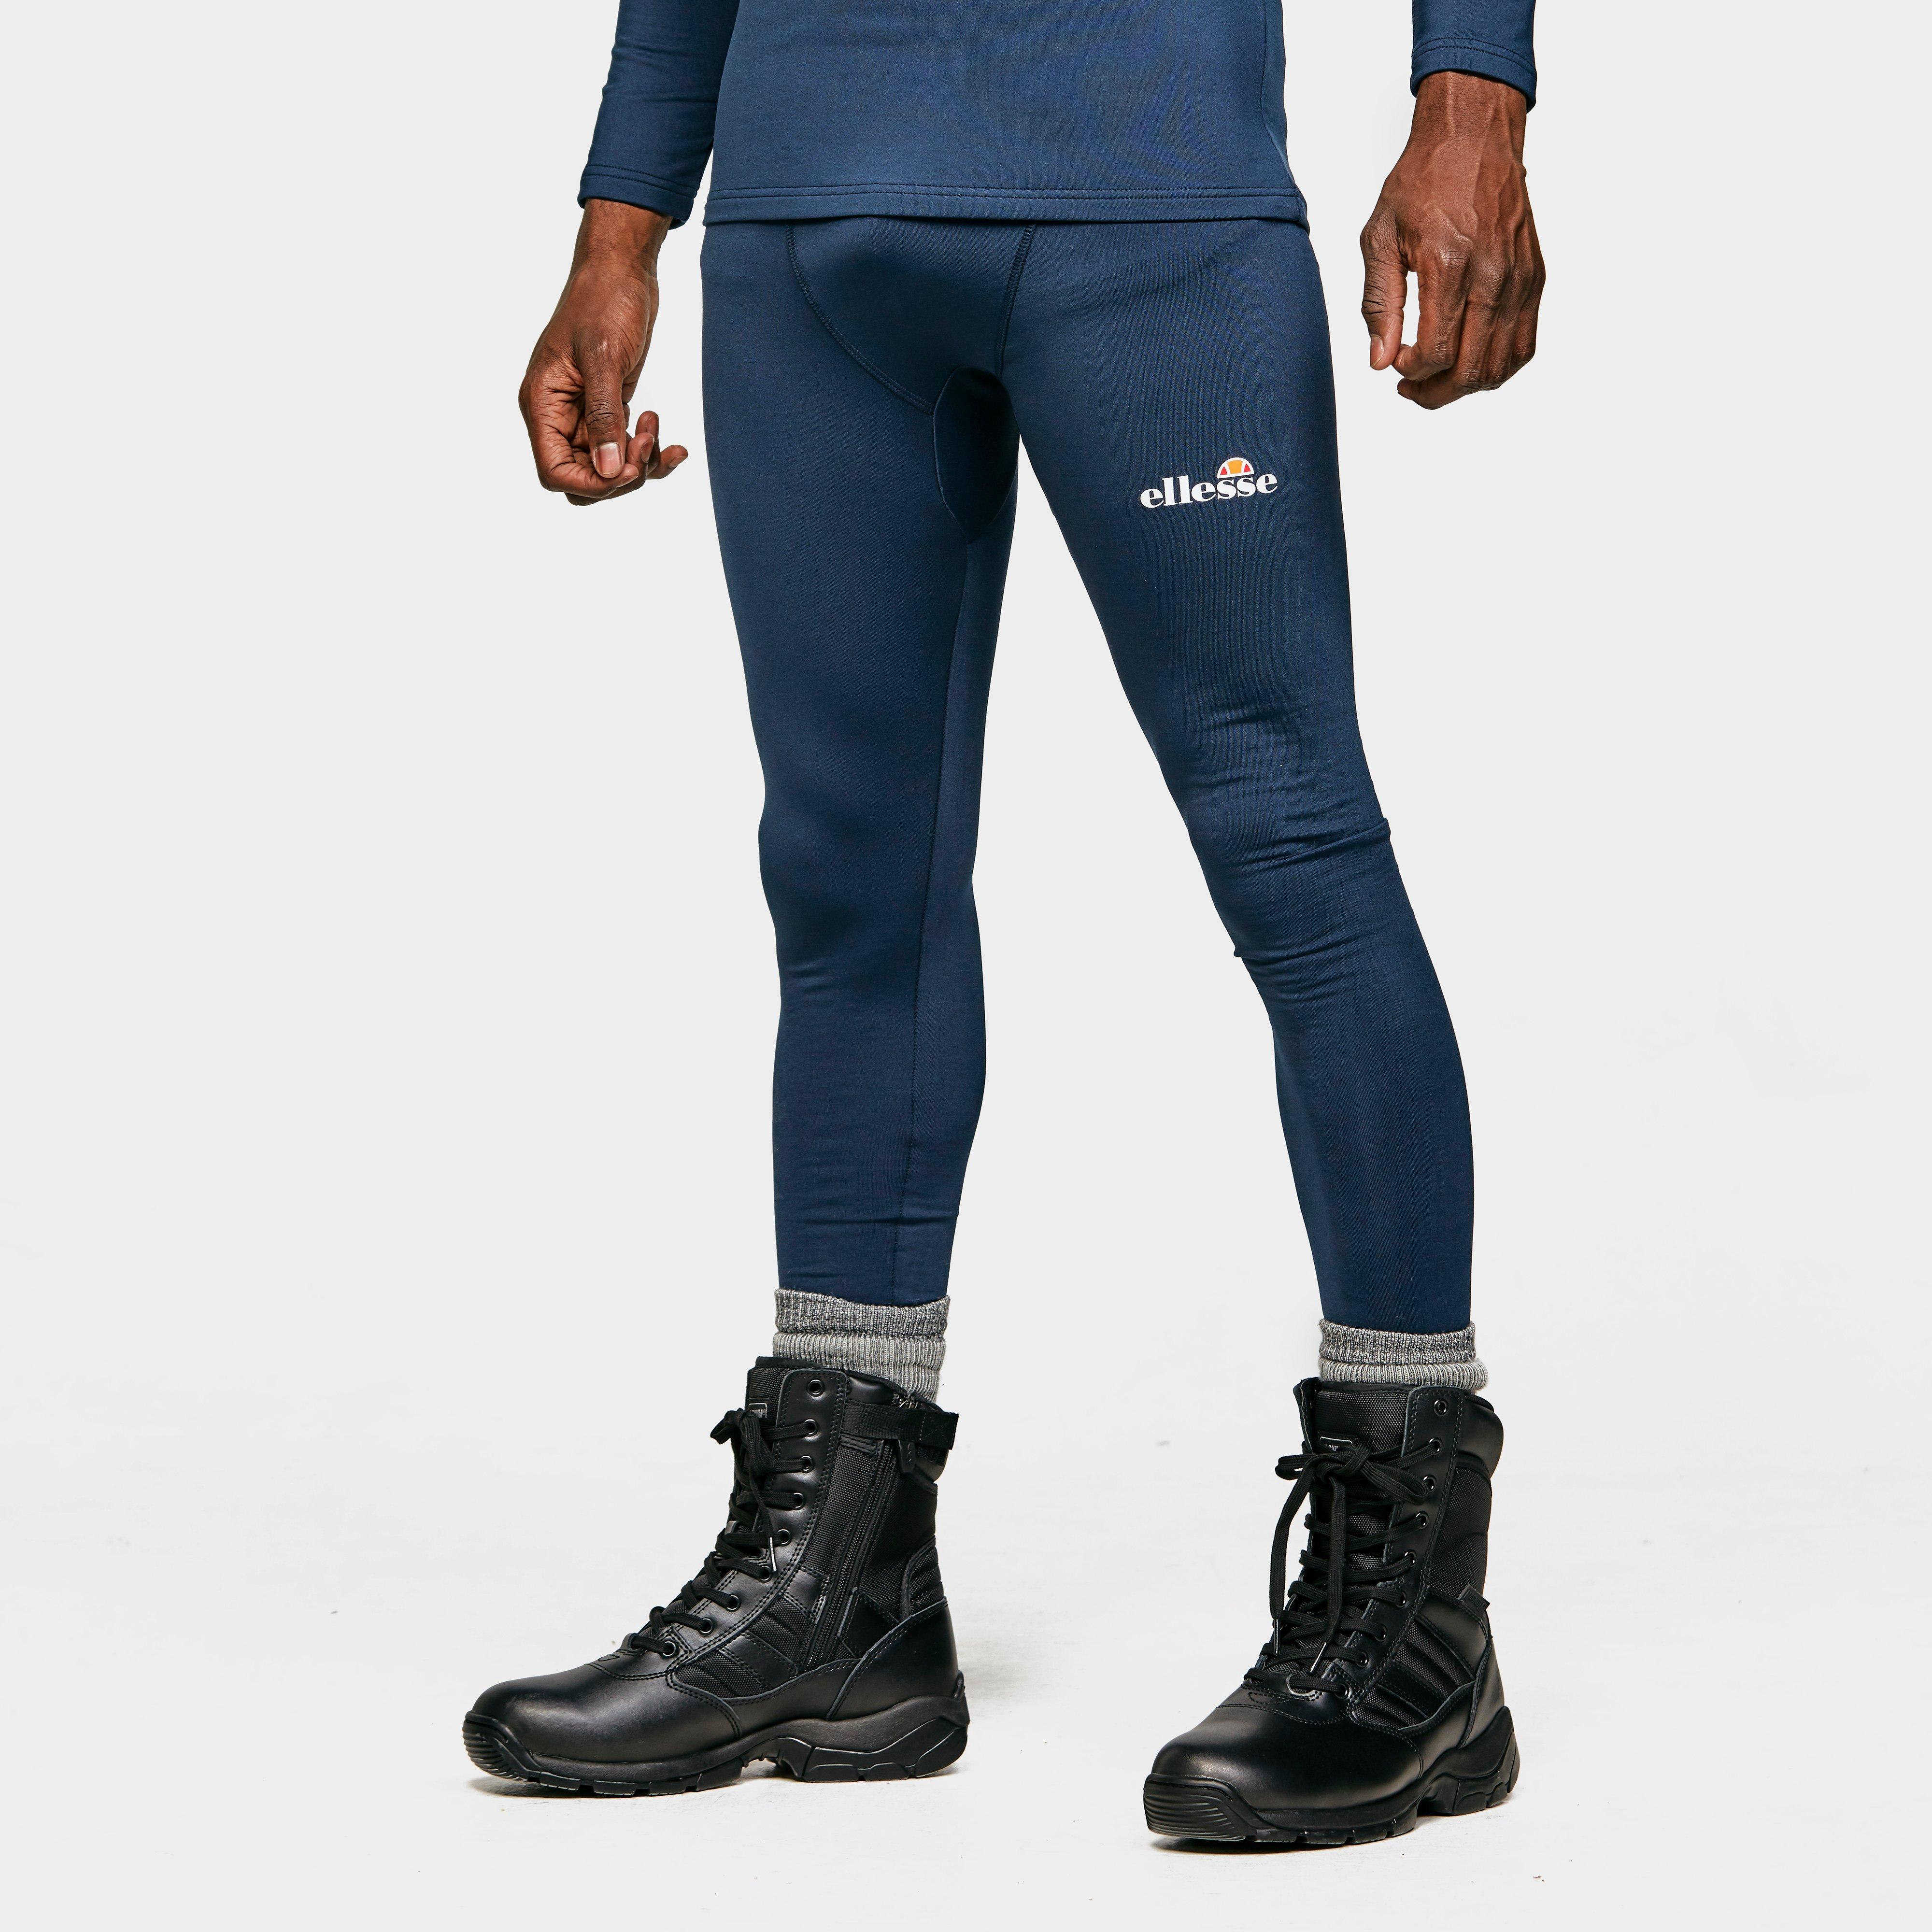 Image of Ellesse Men's Dixon Baselayer Pants - Navy/Dbl, Navy/DBL